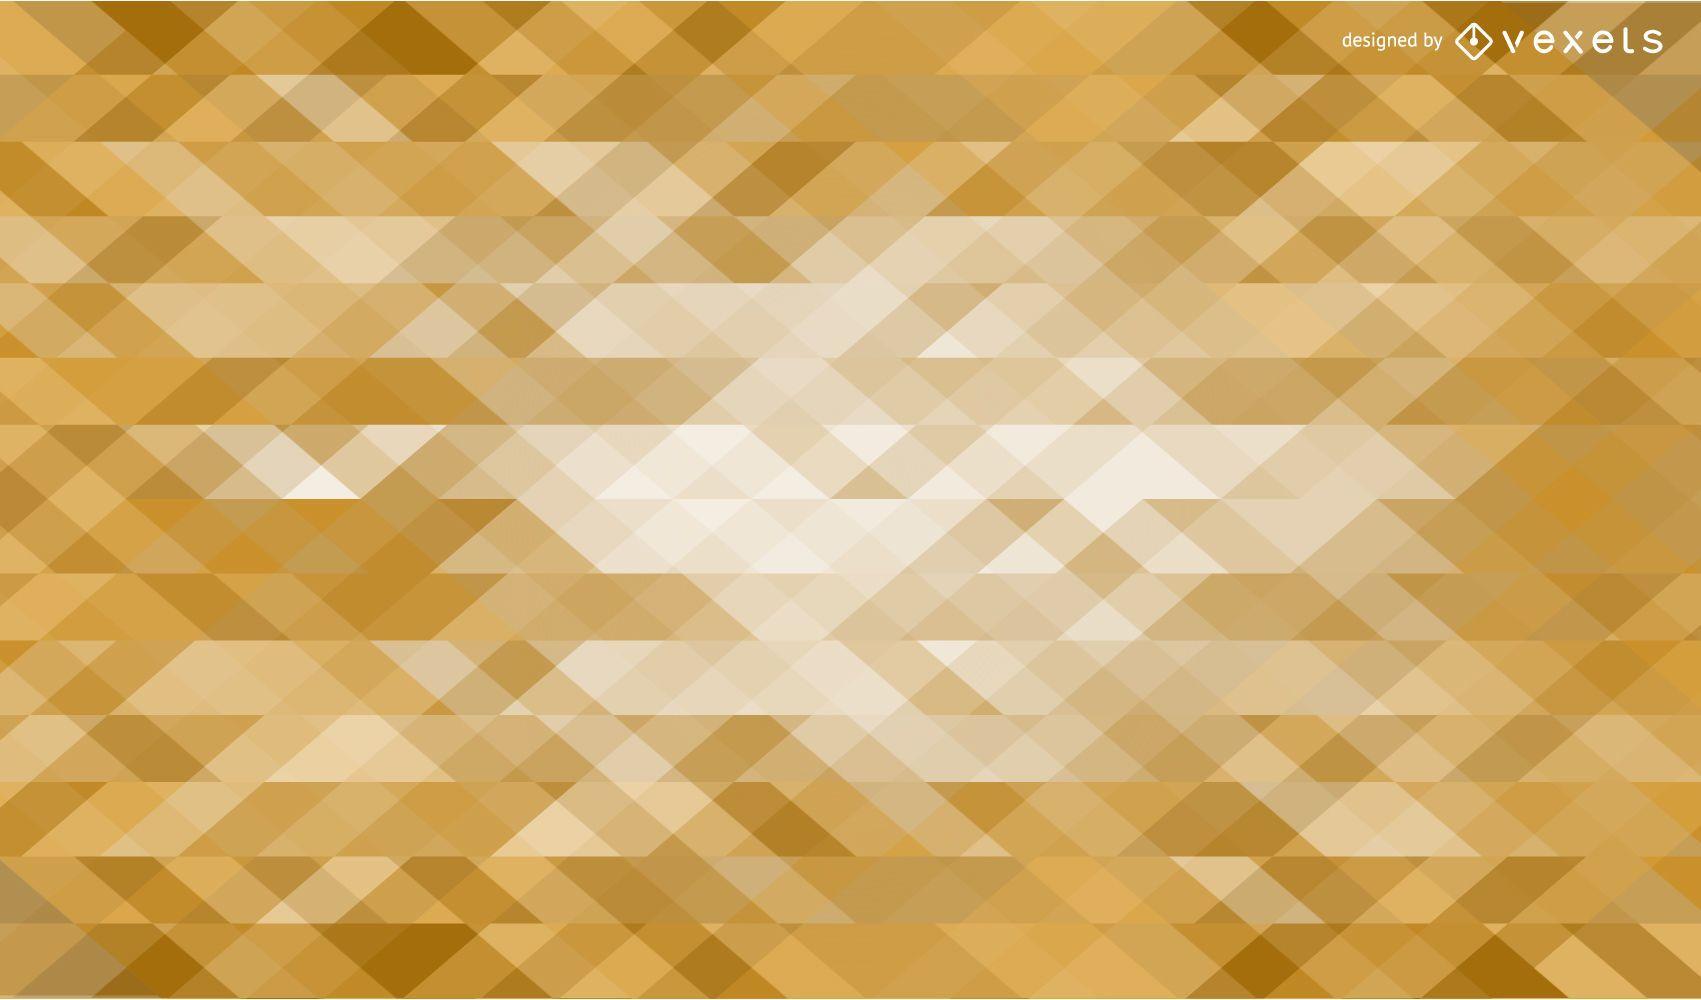 Golden triangles background